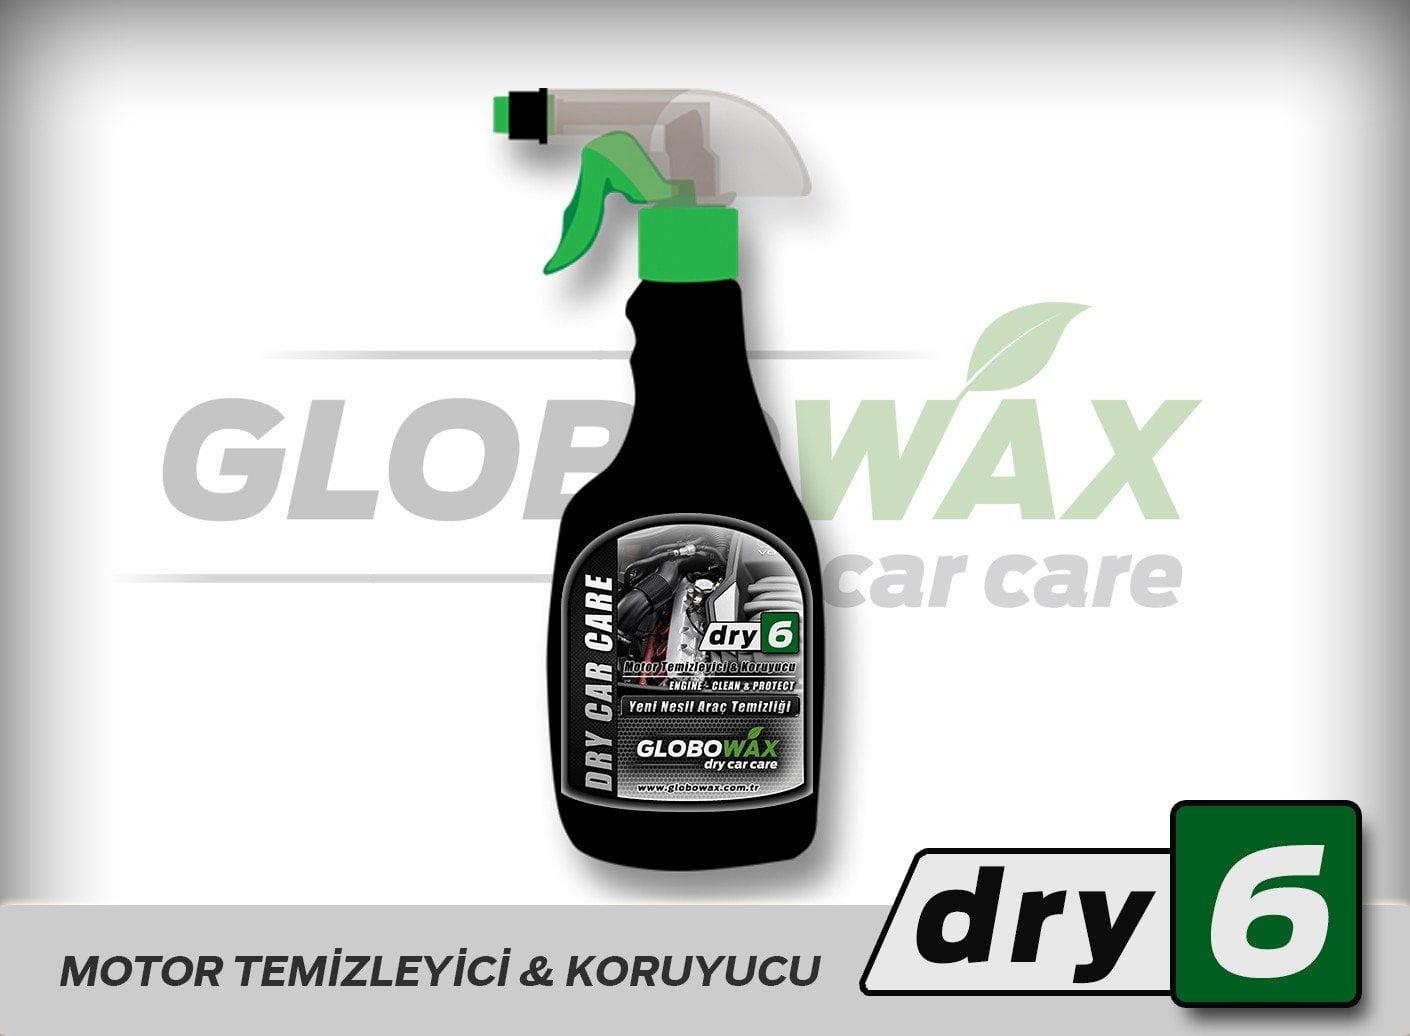 GLOBOWAX-SISE-6-6-6